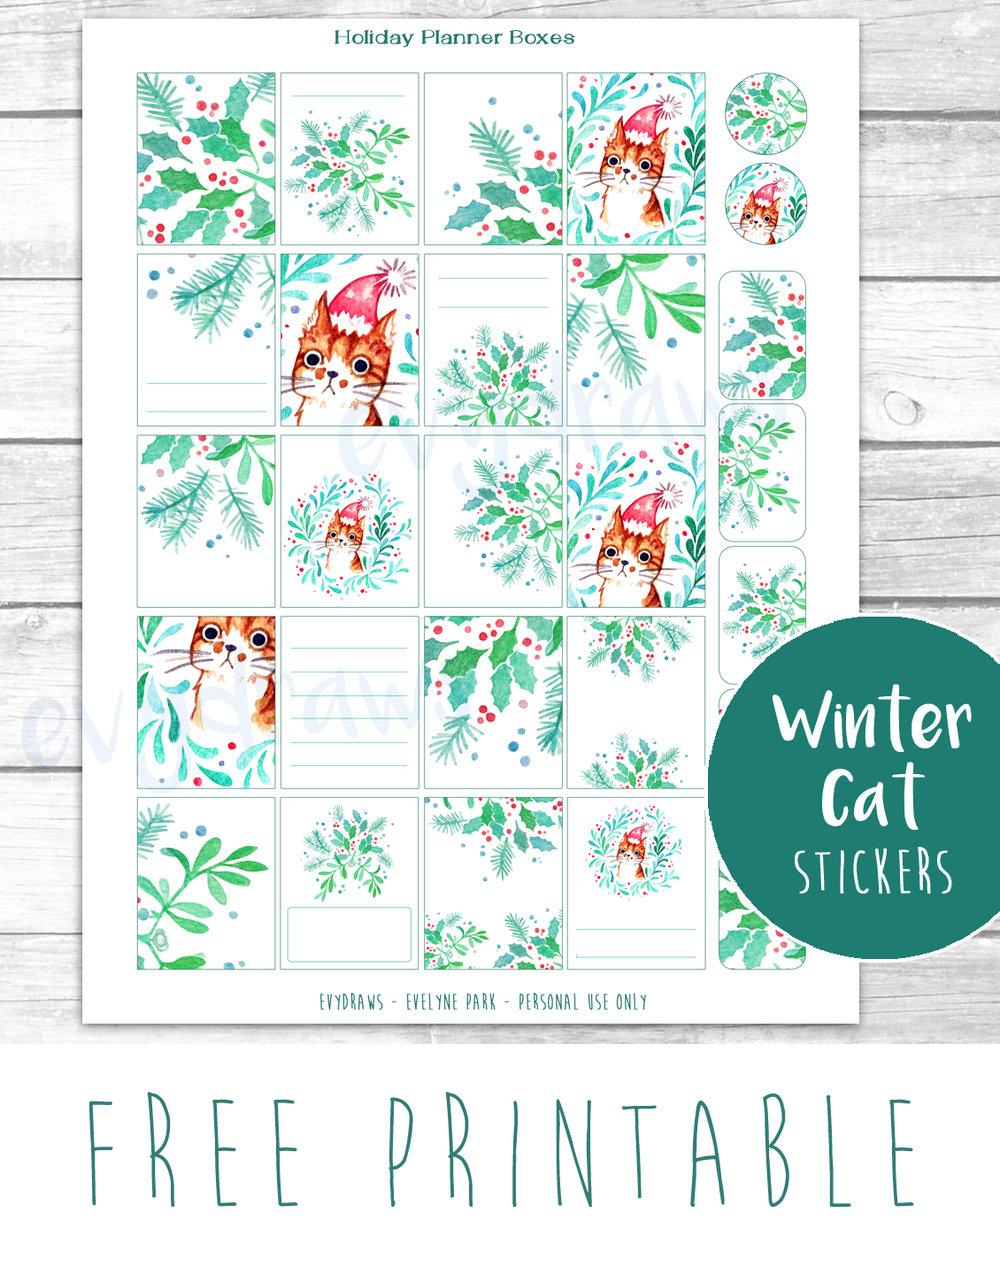 Last-Minute Diy: Free Printable Gift Tags, Stickers & Cards — Evydraws - Free Printable Stickers